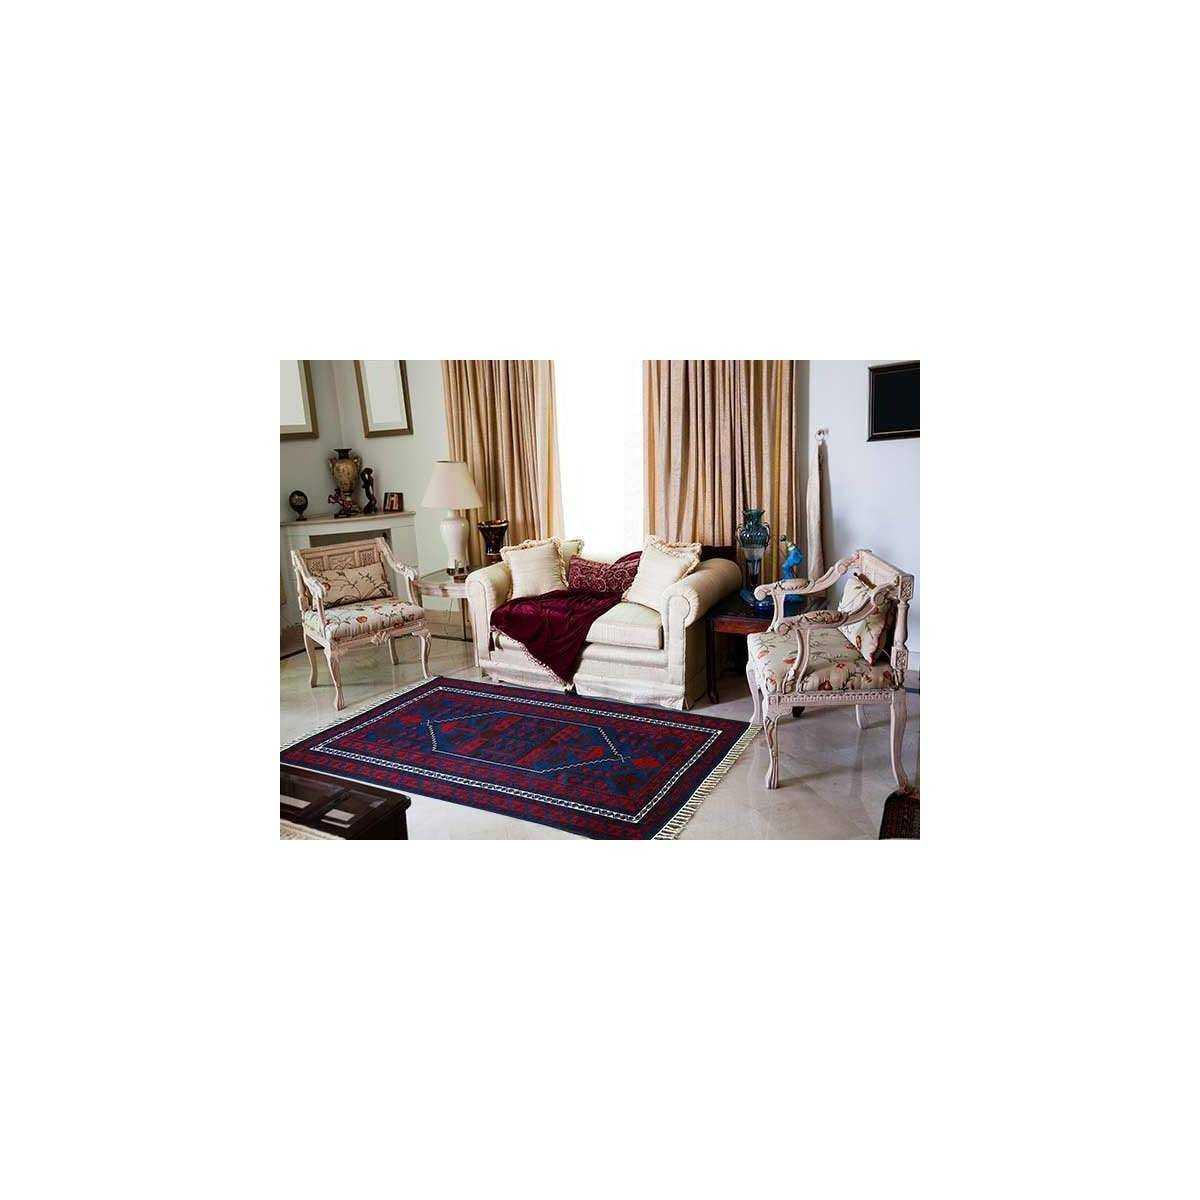 Ковры для дома carpet-home.01 HASKUL HALI